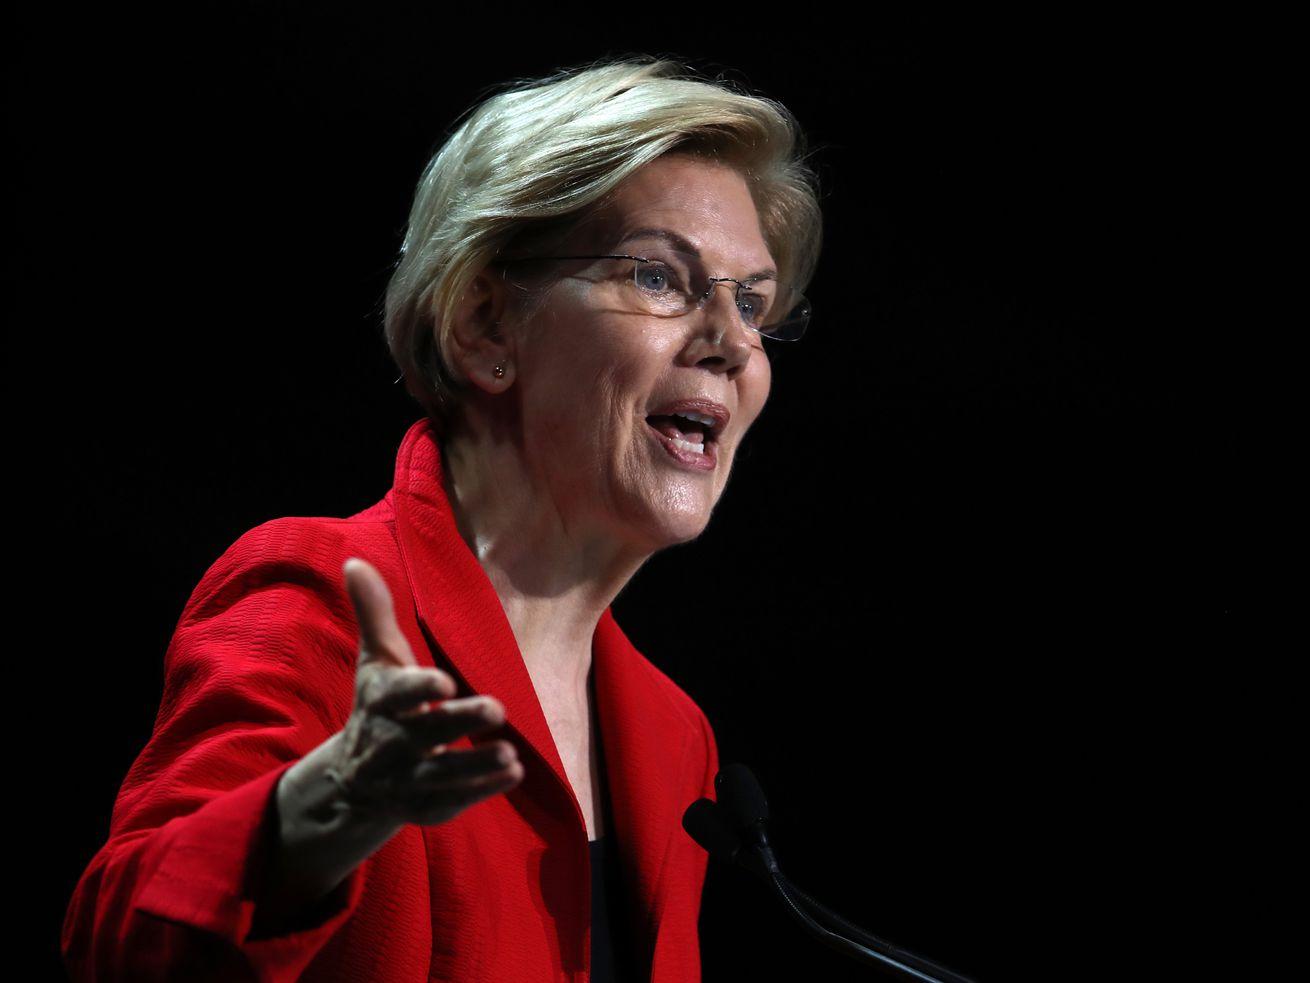 Democratic presidential hopeful Sen. Elizabeth Warren (D-MA) speaks during the California Democrats 2019 State Convention.